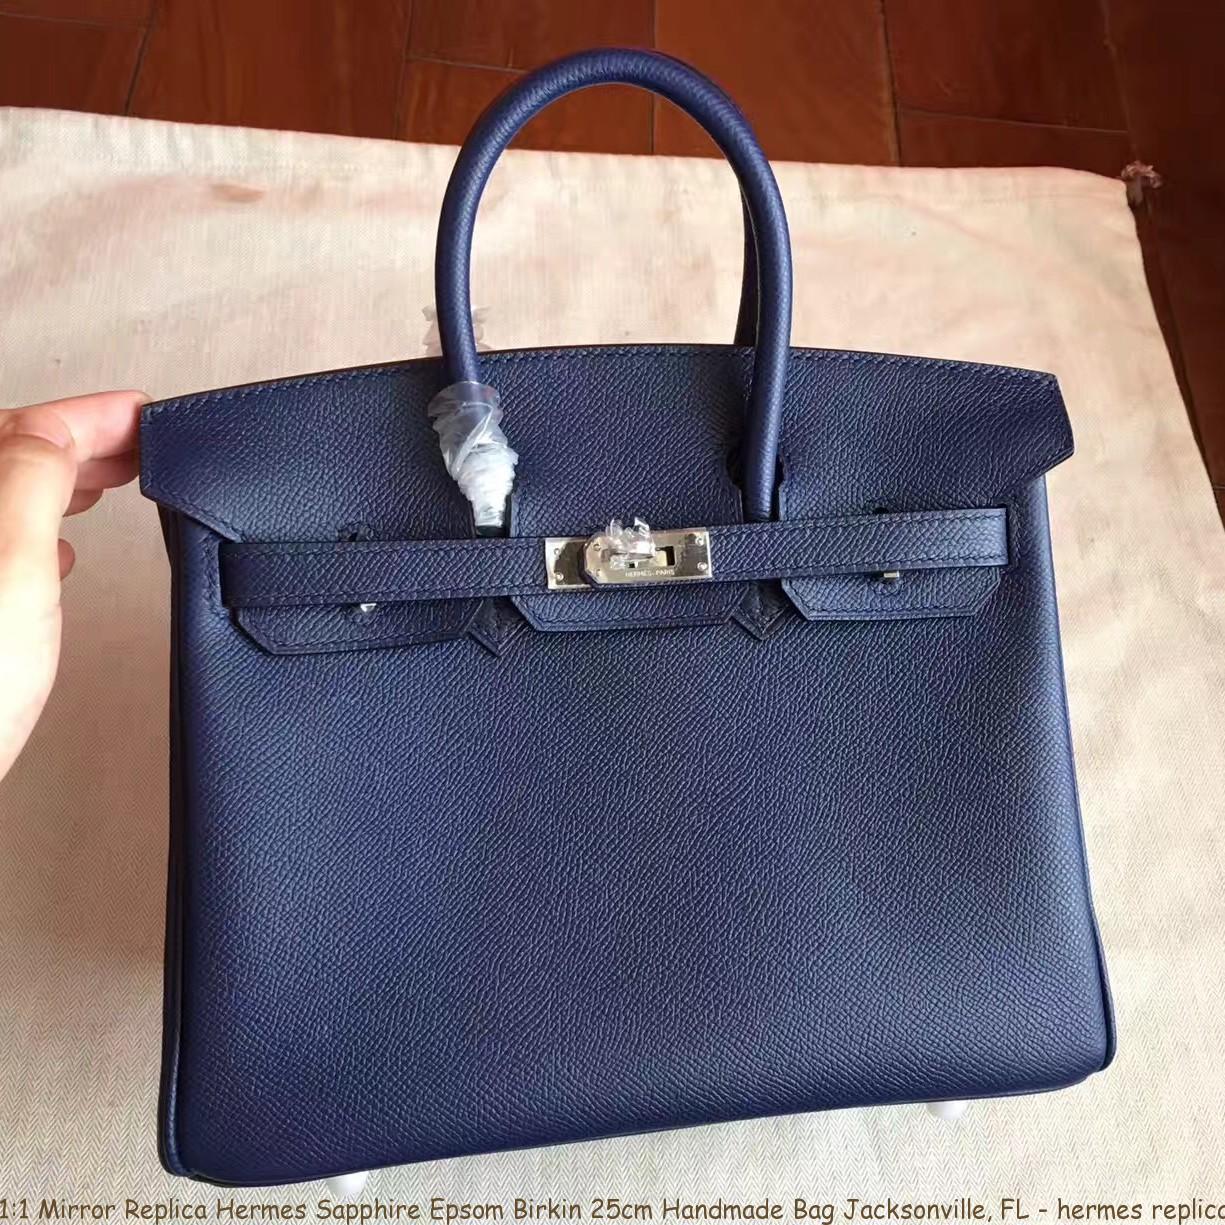 bebb20733 1:1 Mirror Replica Hermes Sapphire Epsom Birkin 25cm Handmade Bag ...